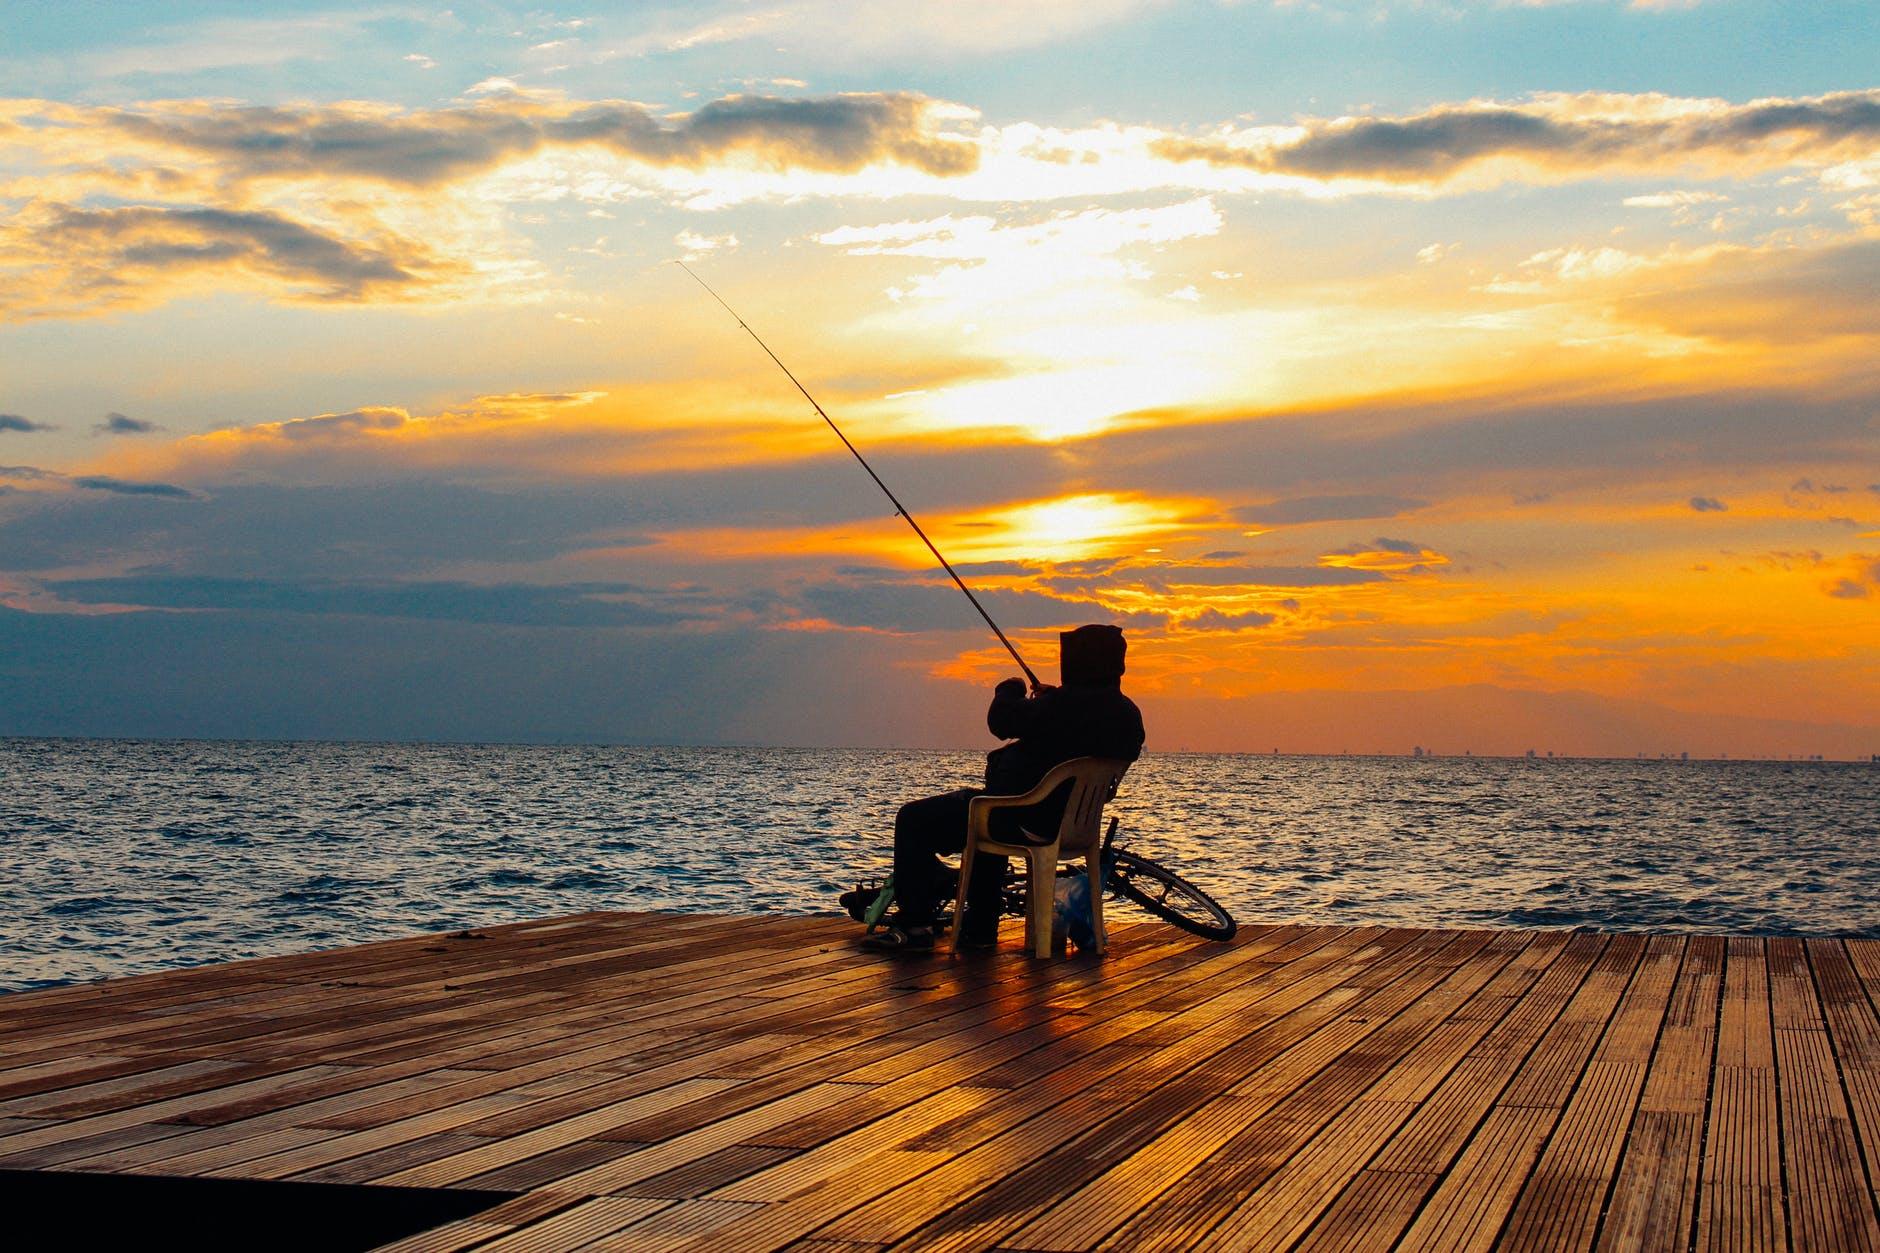 ISLAND HEIGHTS: People Caught Fishing